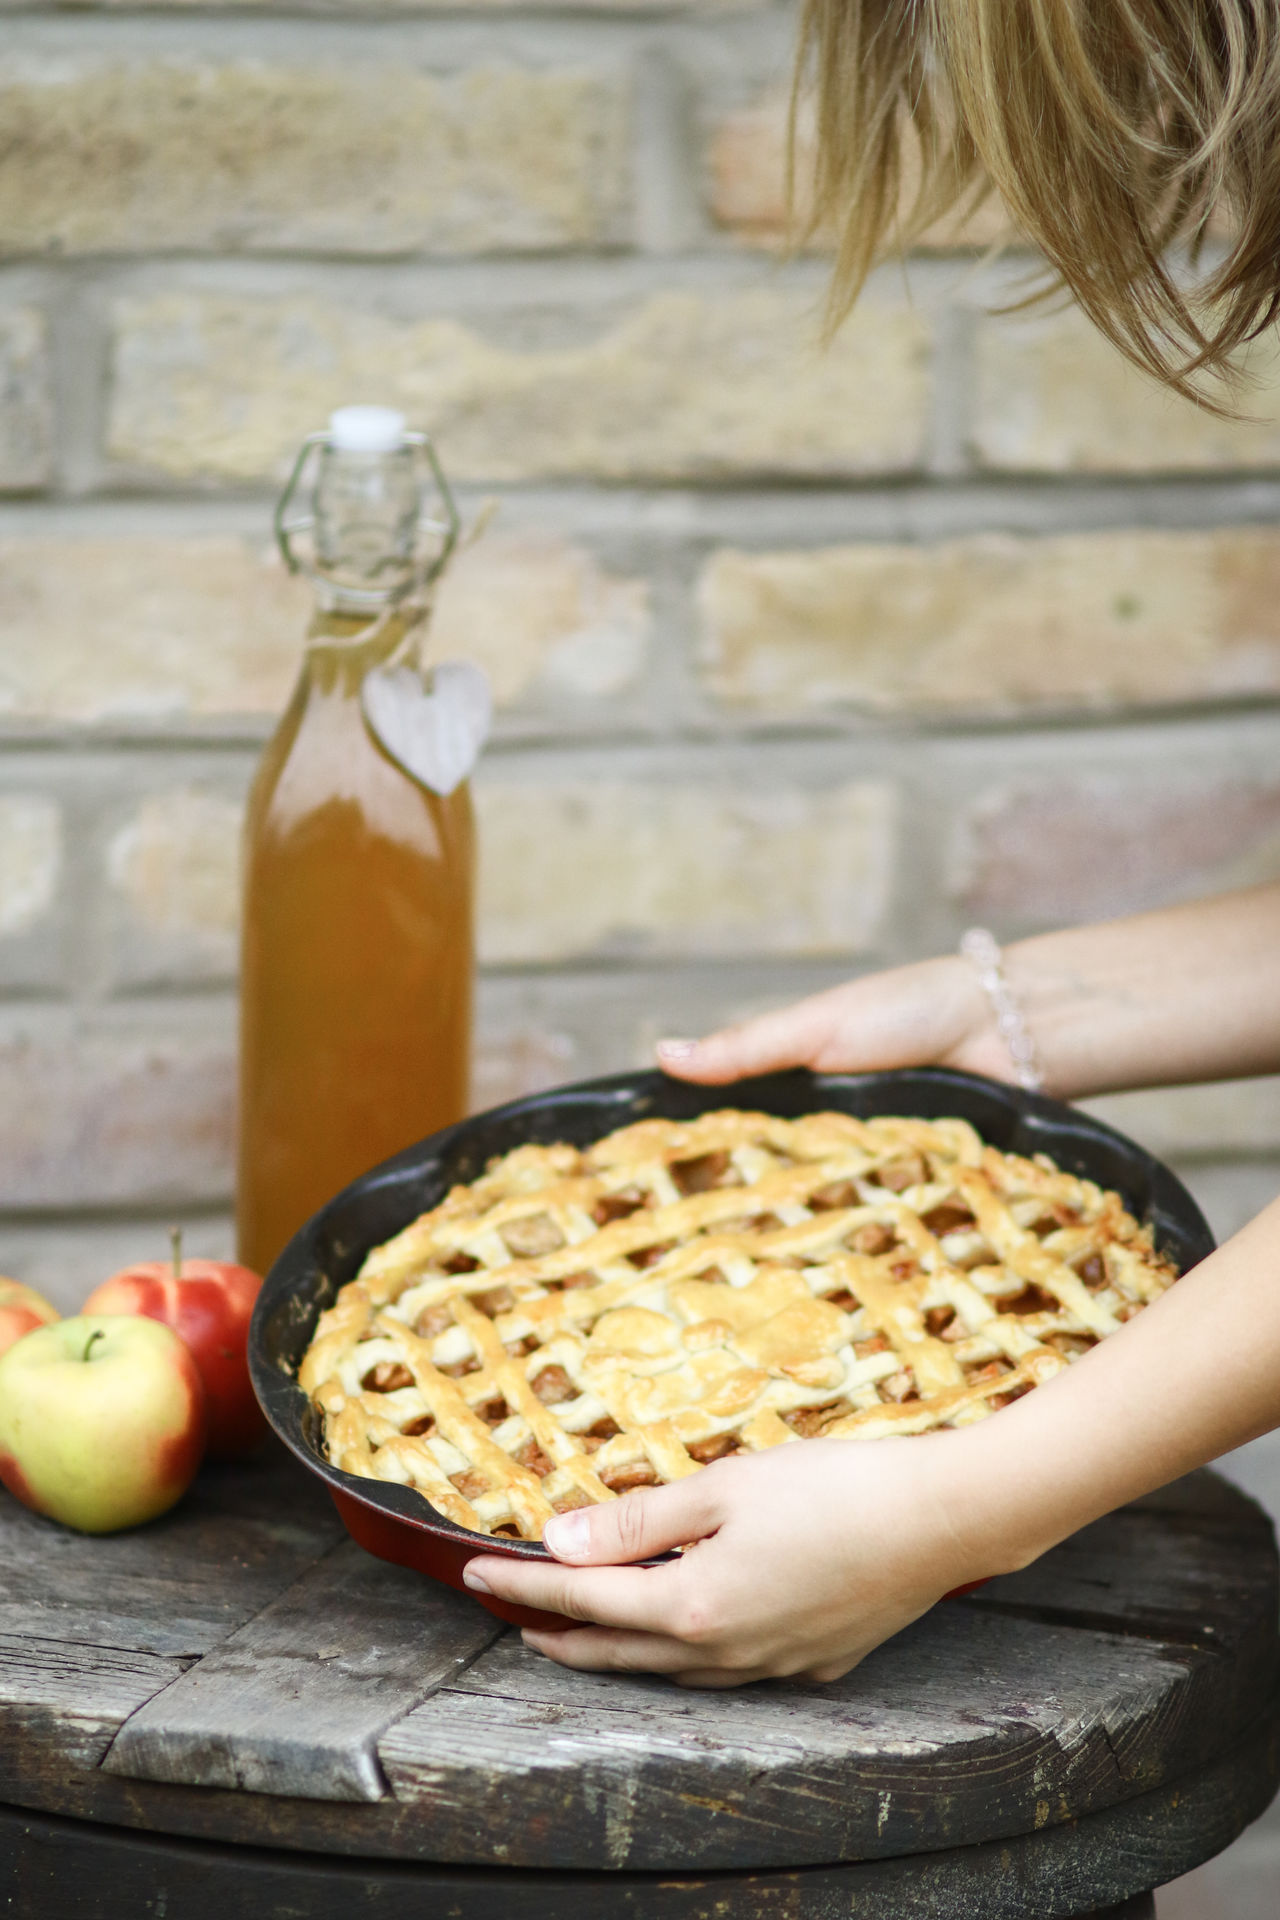 Apple Cake Apple Pie Apple Tart Cake Cake Time Cakeporn Pie Tart